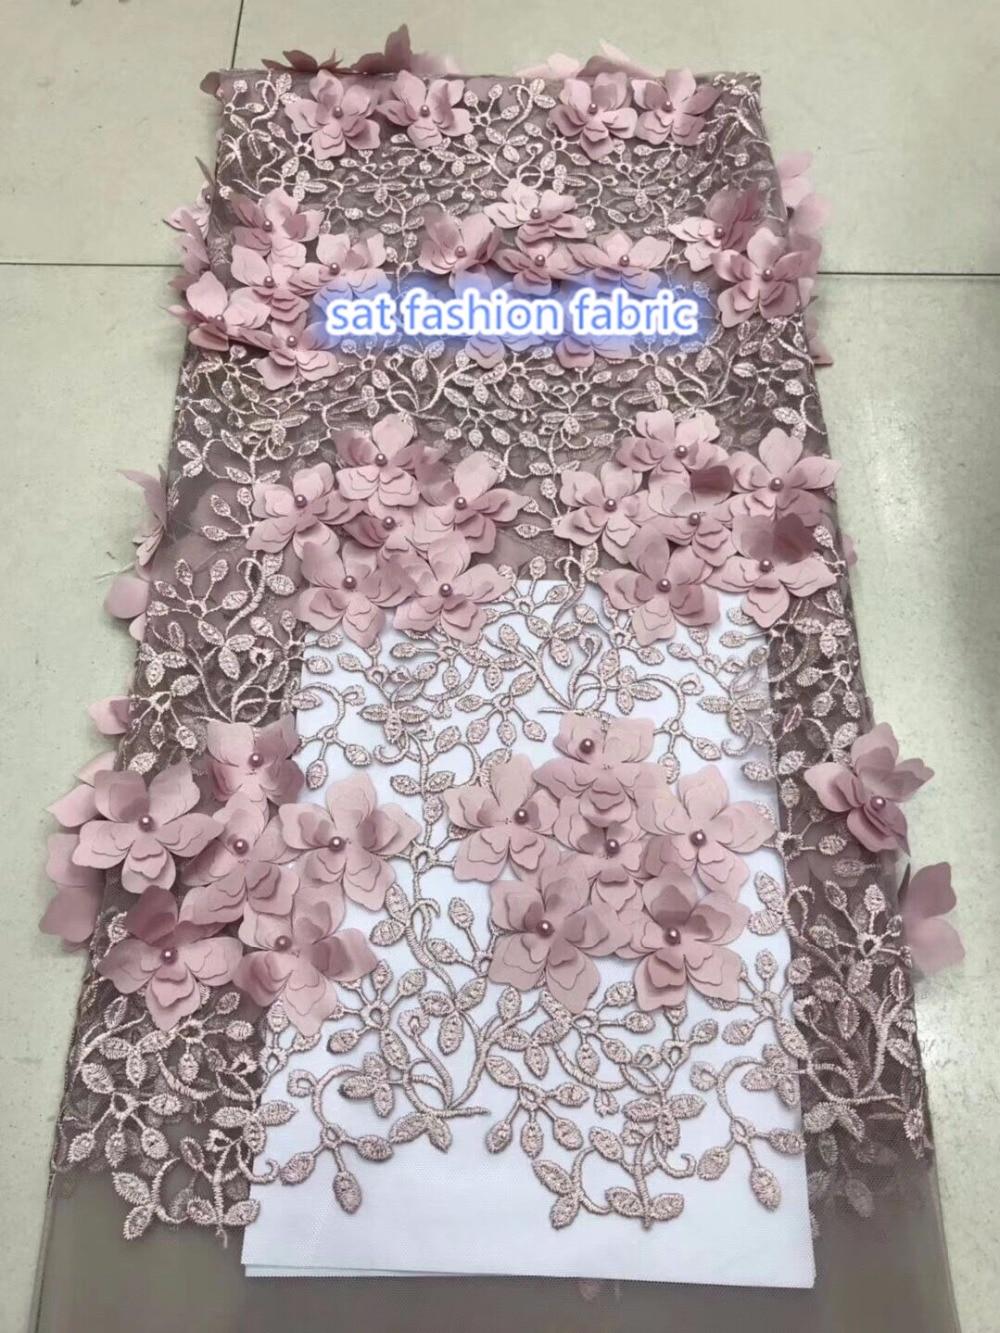 Sat 666 13 구슬과 럭셔리 3d 꽃 자수 얇은 명주 그물 레이스 원단-에서레이스부터 홈 & 가든 의  그룹 1